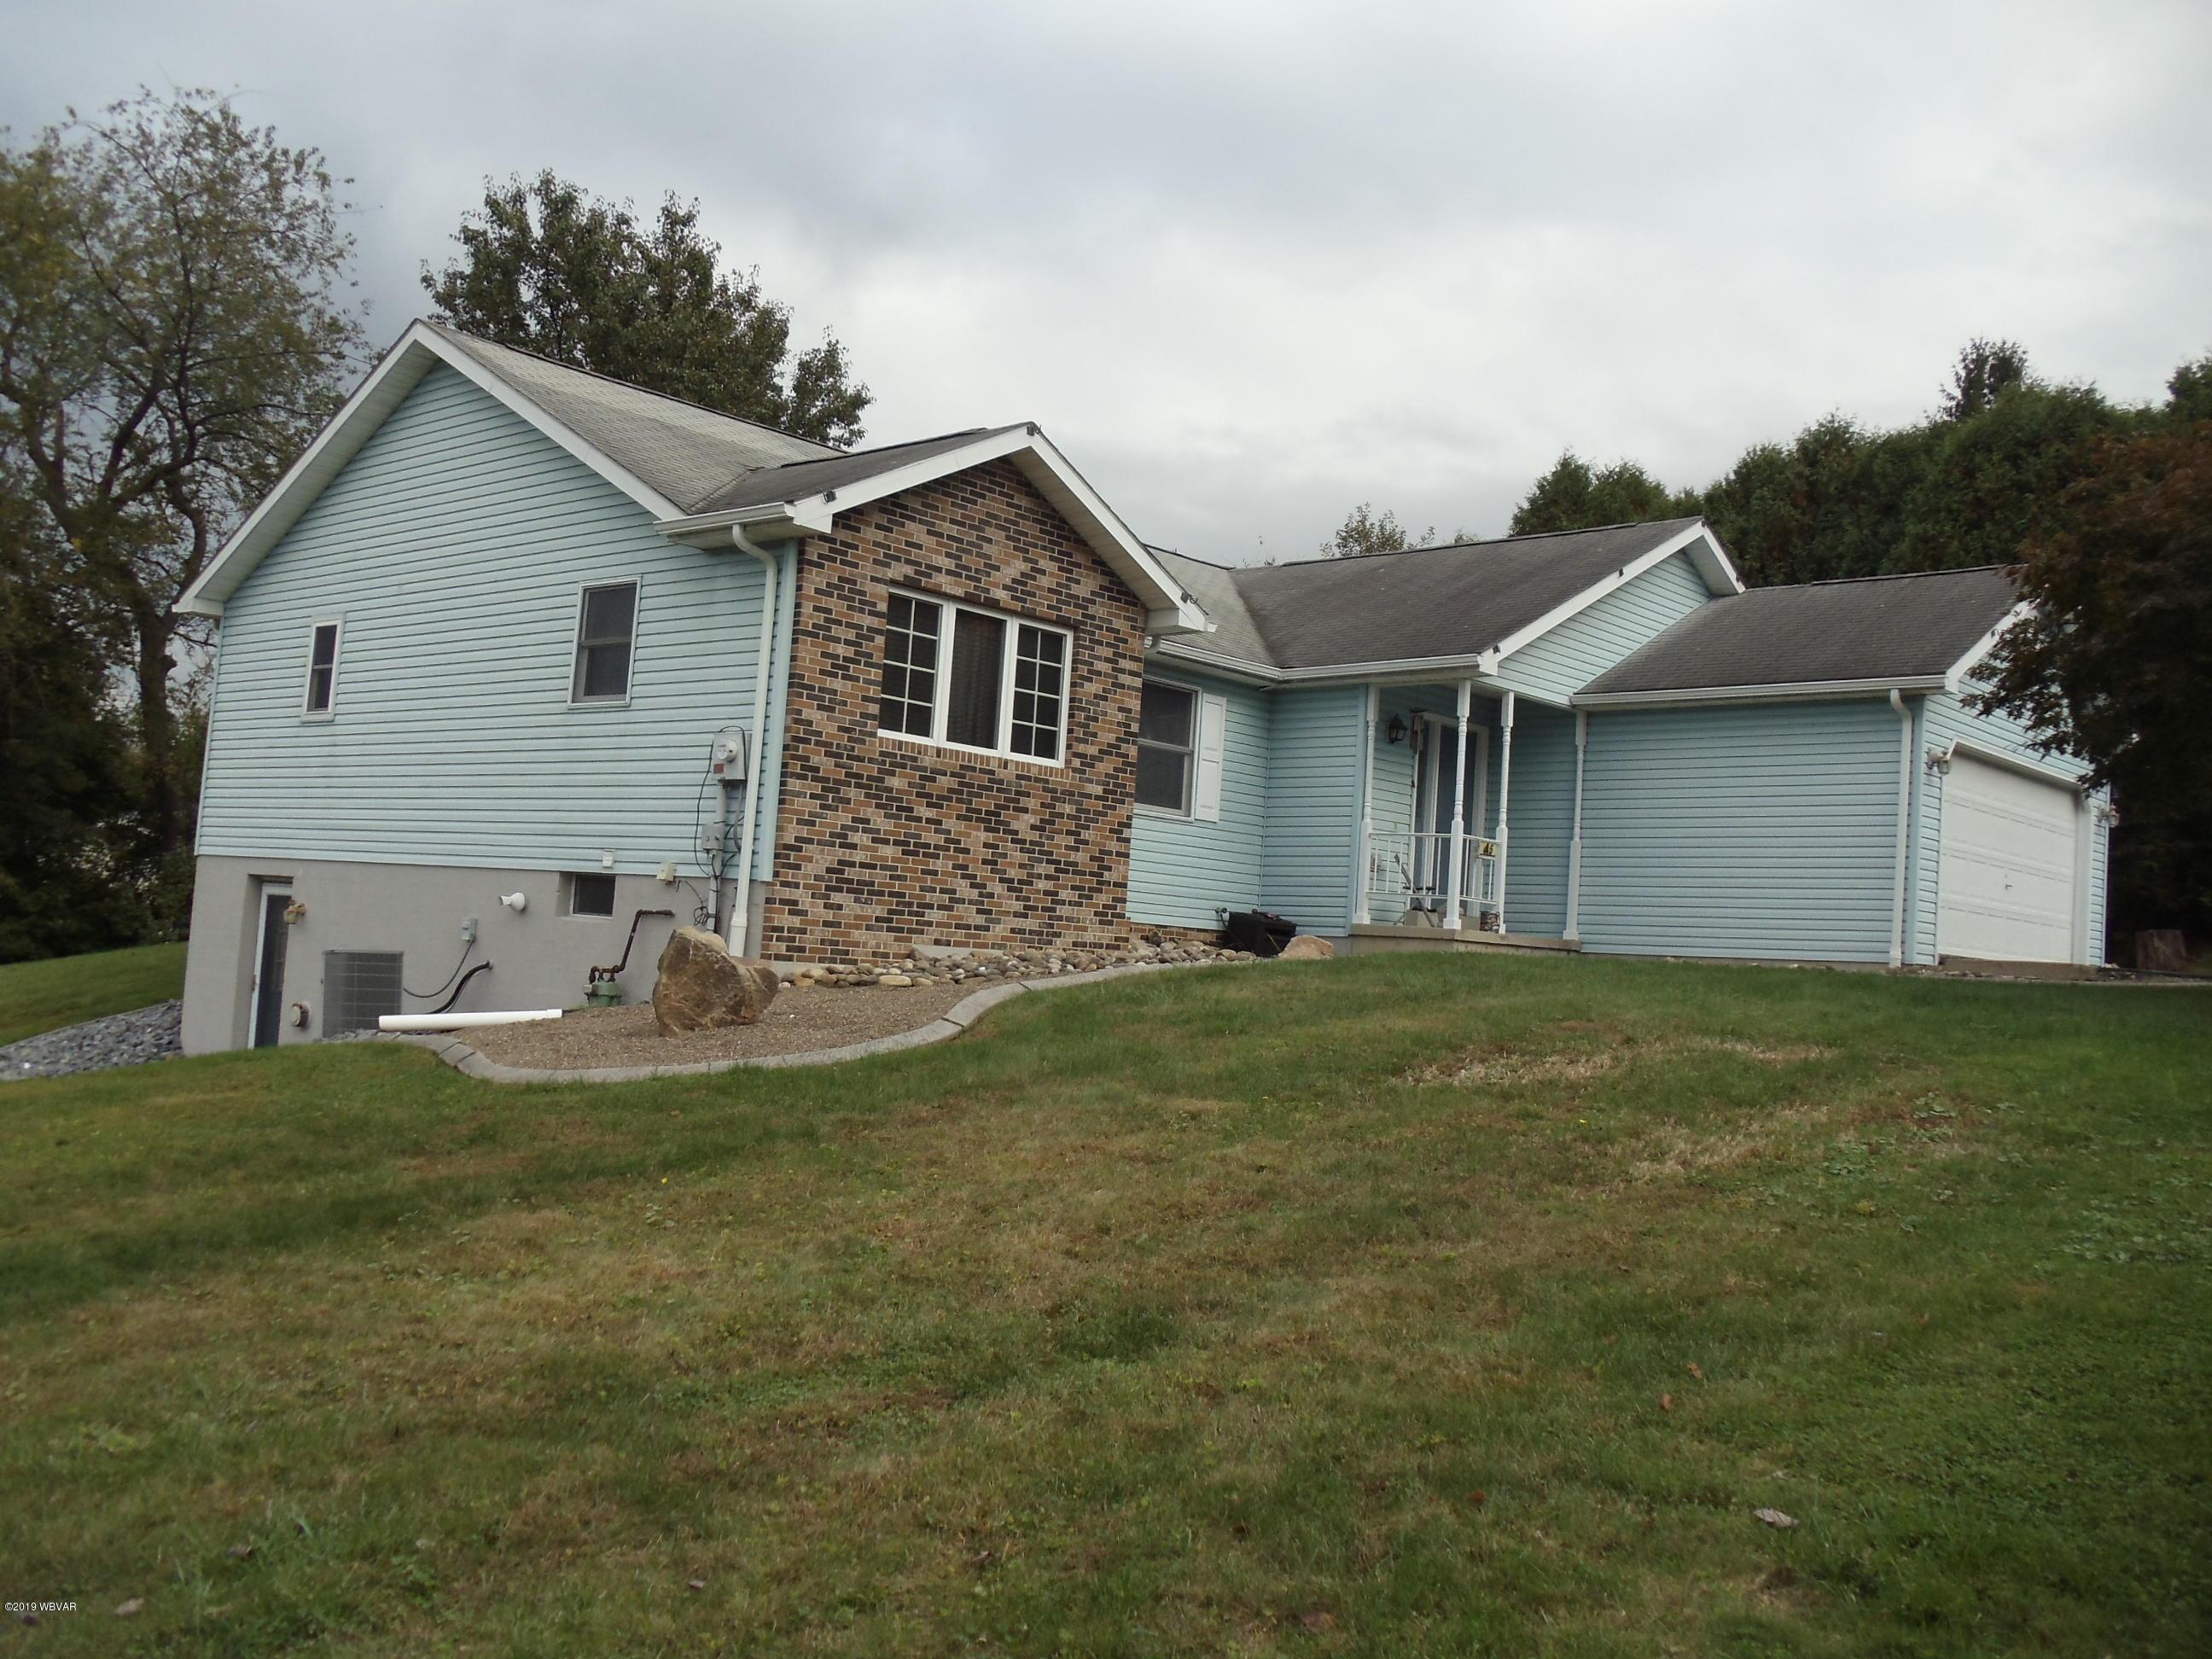 445 JACULIN AVENUE,S. Williamsport,PA 17702,4 Bedrooms Bedrooms,2 BathroomsBathrooms,Residential,JACULIN,WB-88806